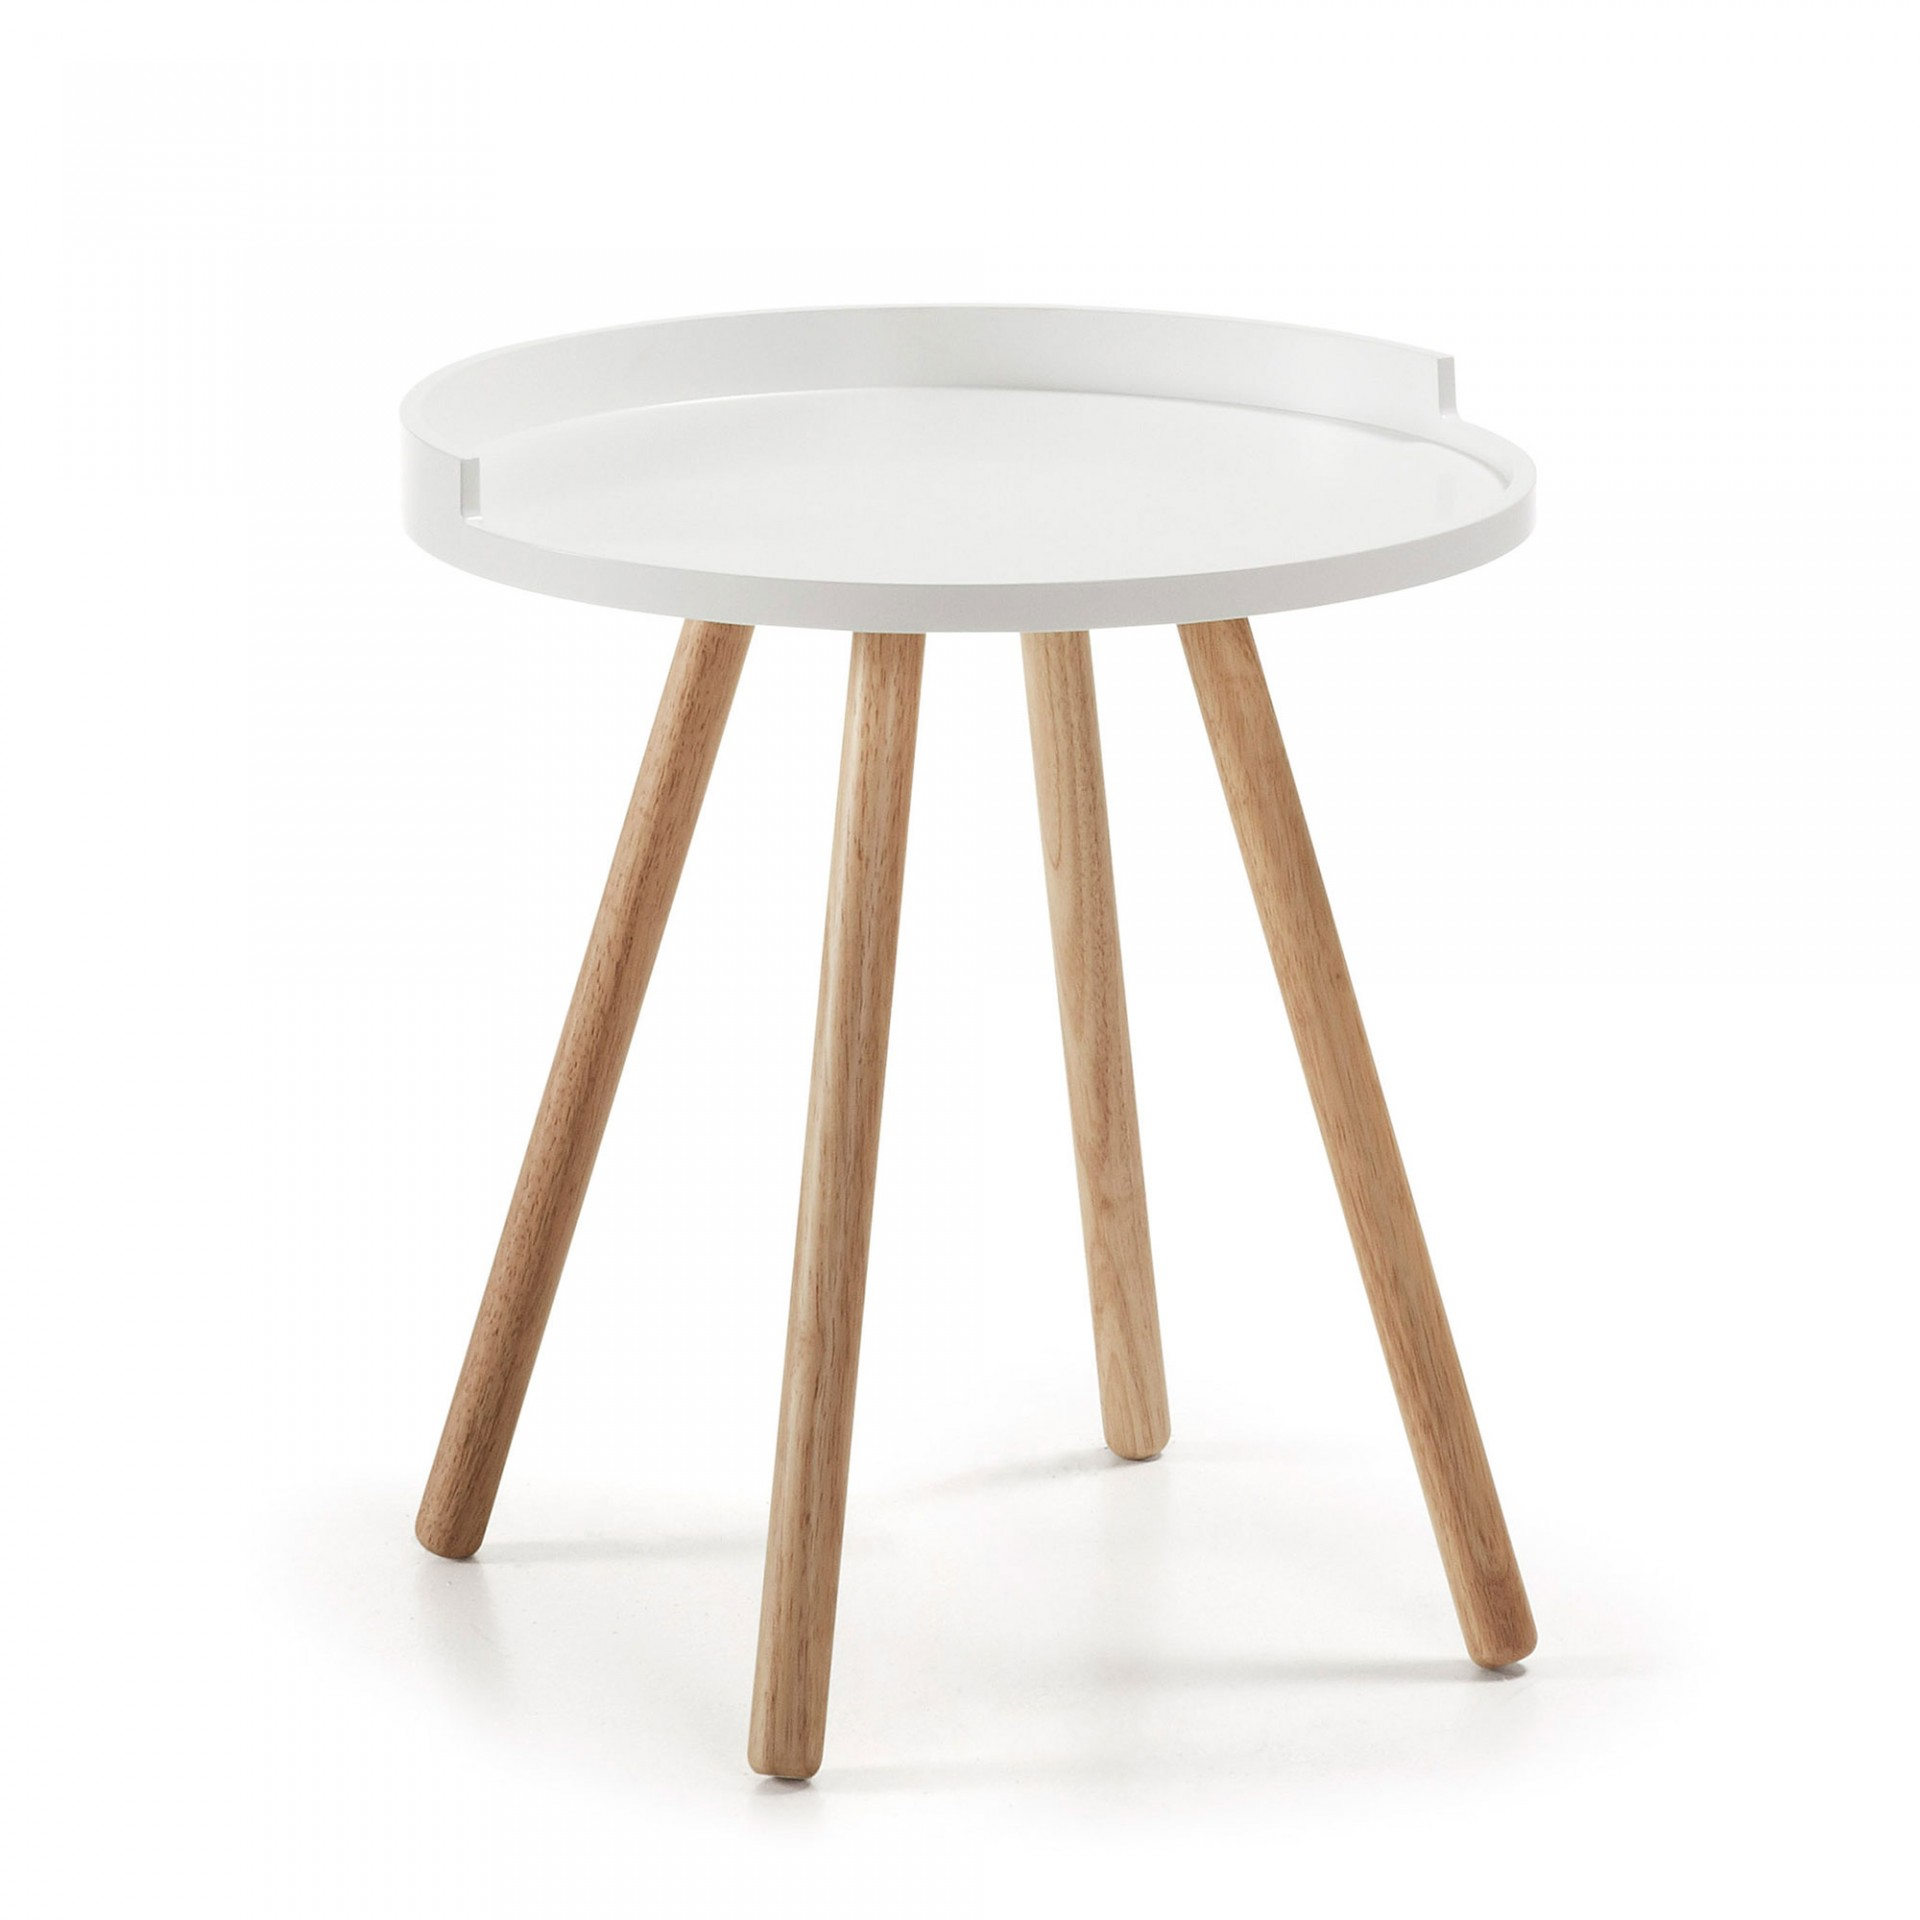 Mesa de apoio Kurt, madeira de seringueira/MDF lacado, Ø46x46